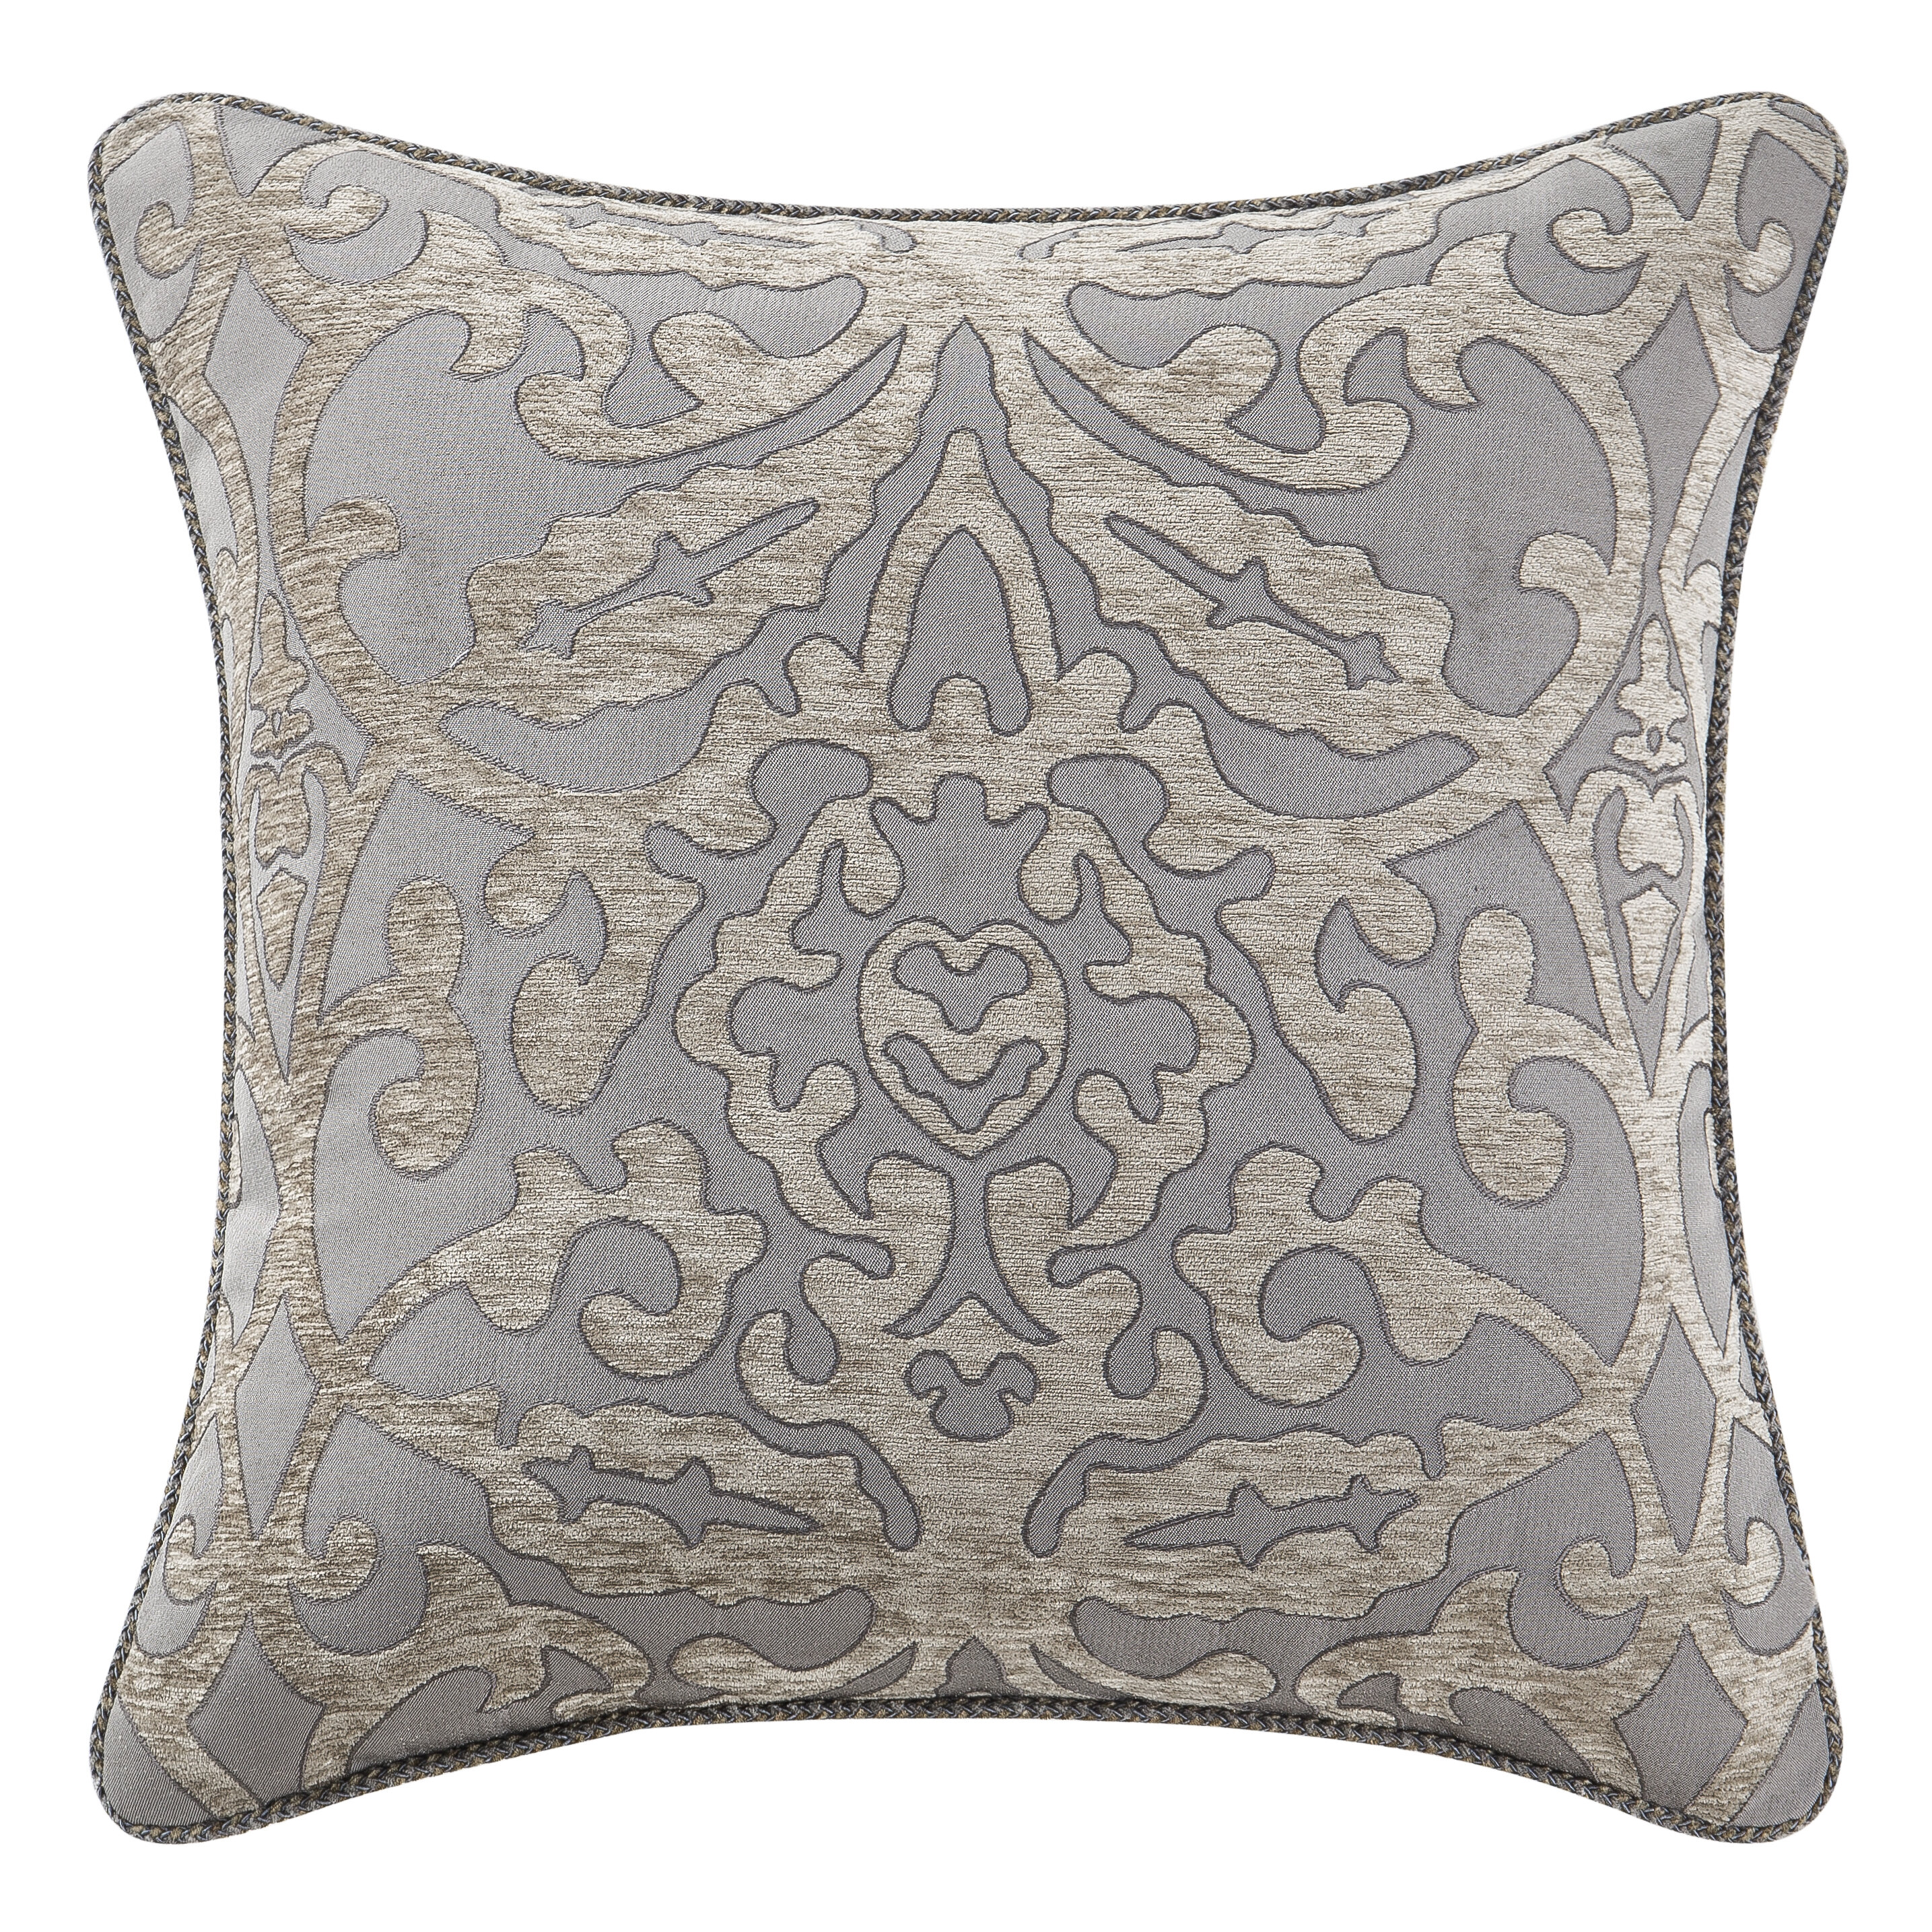 Waterford Bedding Carrick Throw Pillow Reviews Wayfair Ca